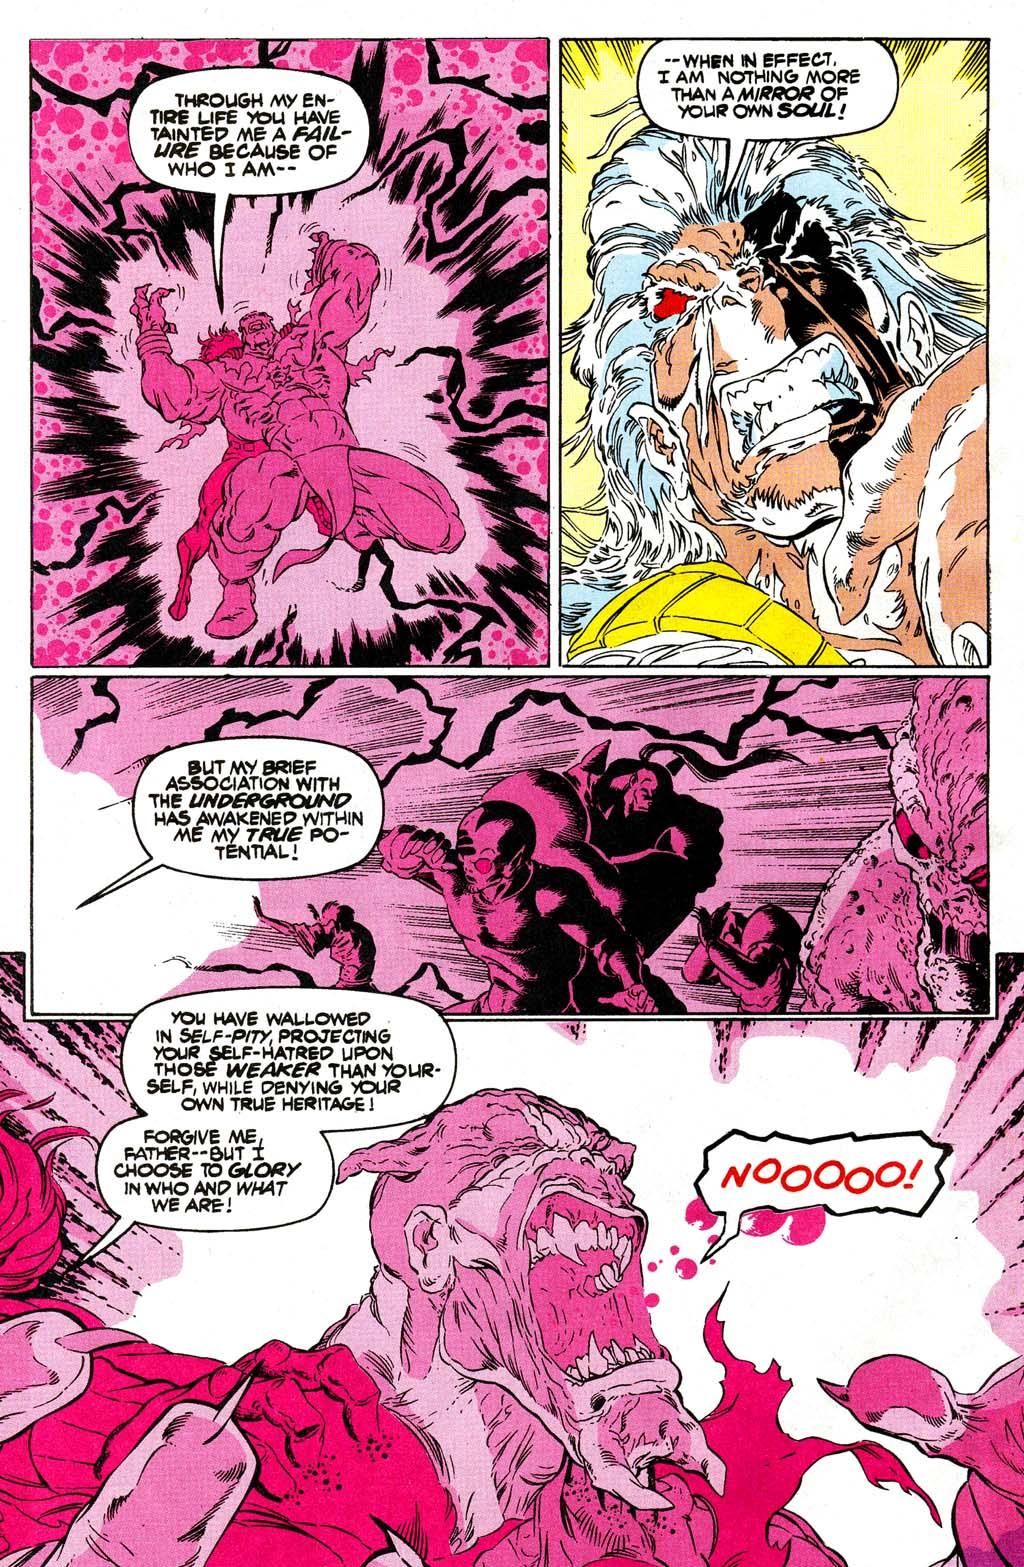 Read online Blackwulf comic -  Issue #10 - 17